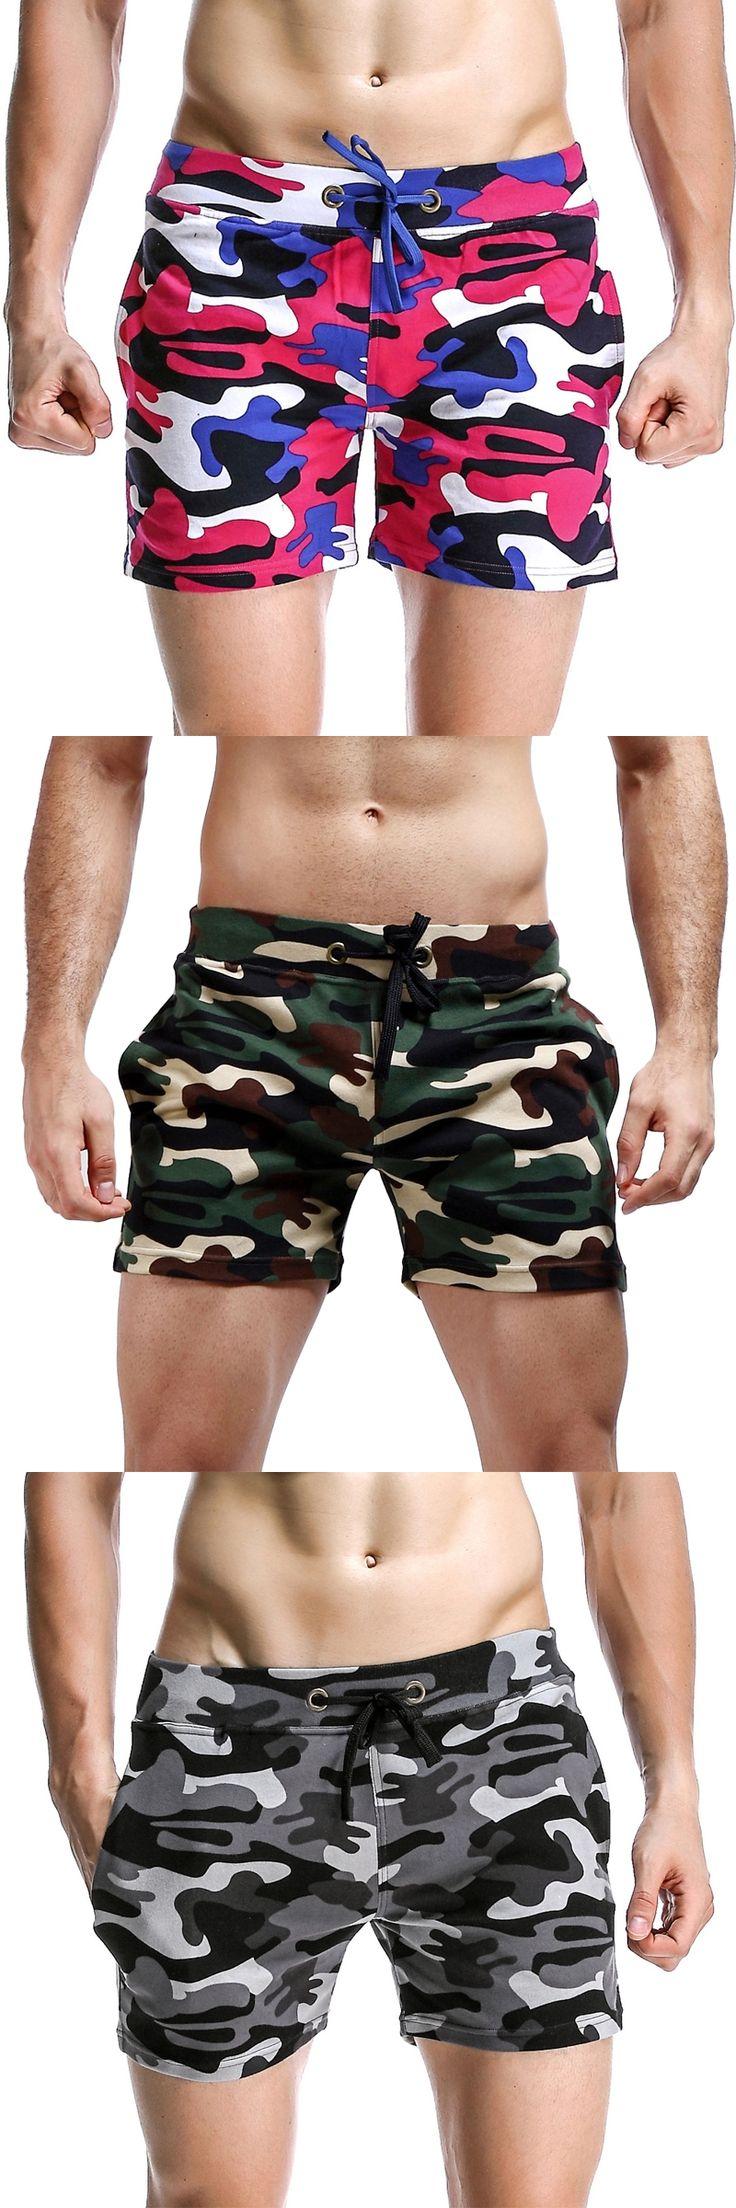 Fashion Camouflage Shorts Men Low Waist Men Casual Trunks Comfort Homewear Fitness Workout Shorts